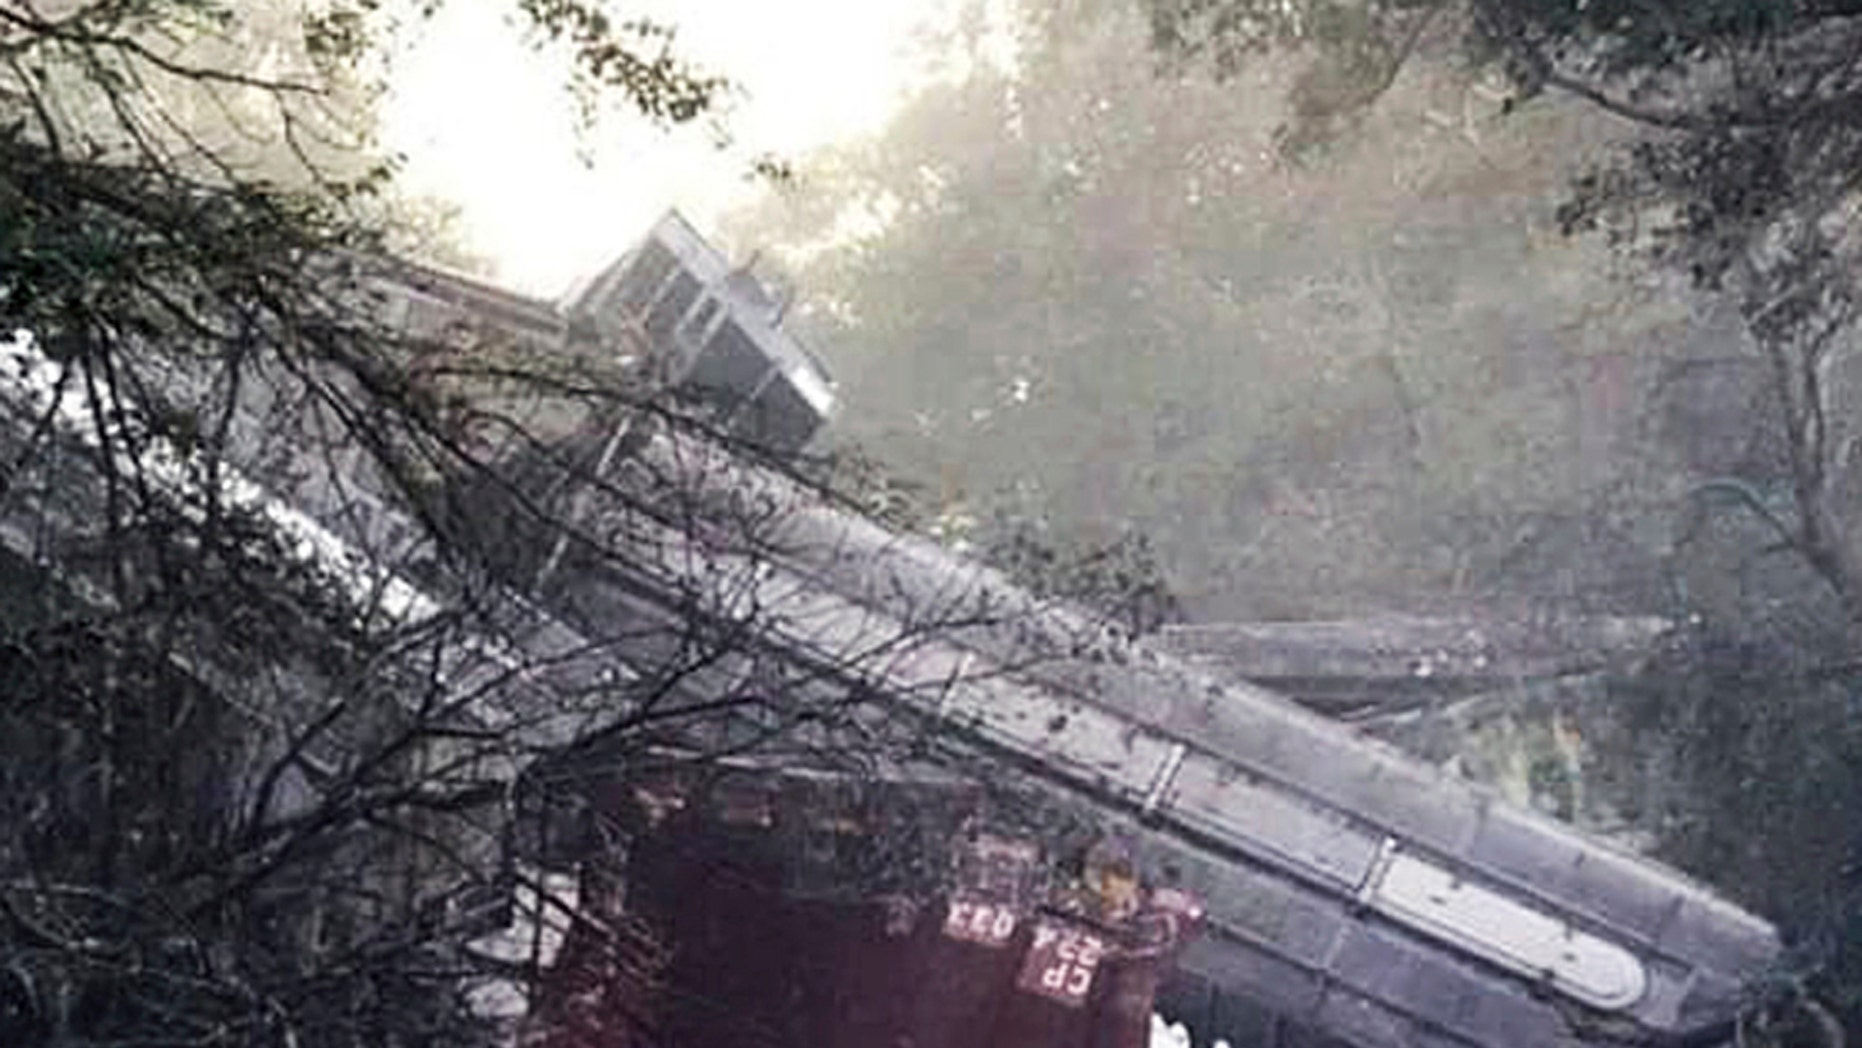 This photo provided by Montezuma police shows a train derailment on Saturday, Nov. 17, 2018 in Byromville, Ga.